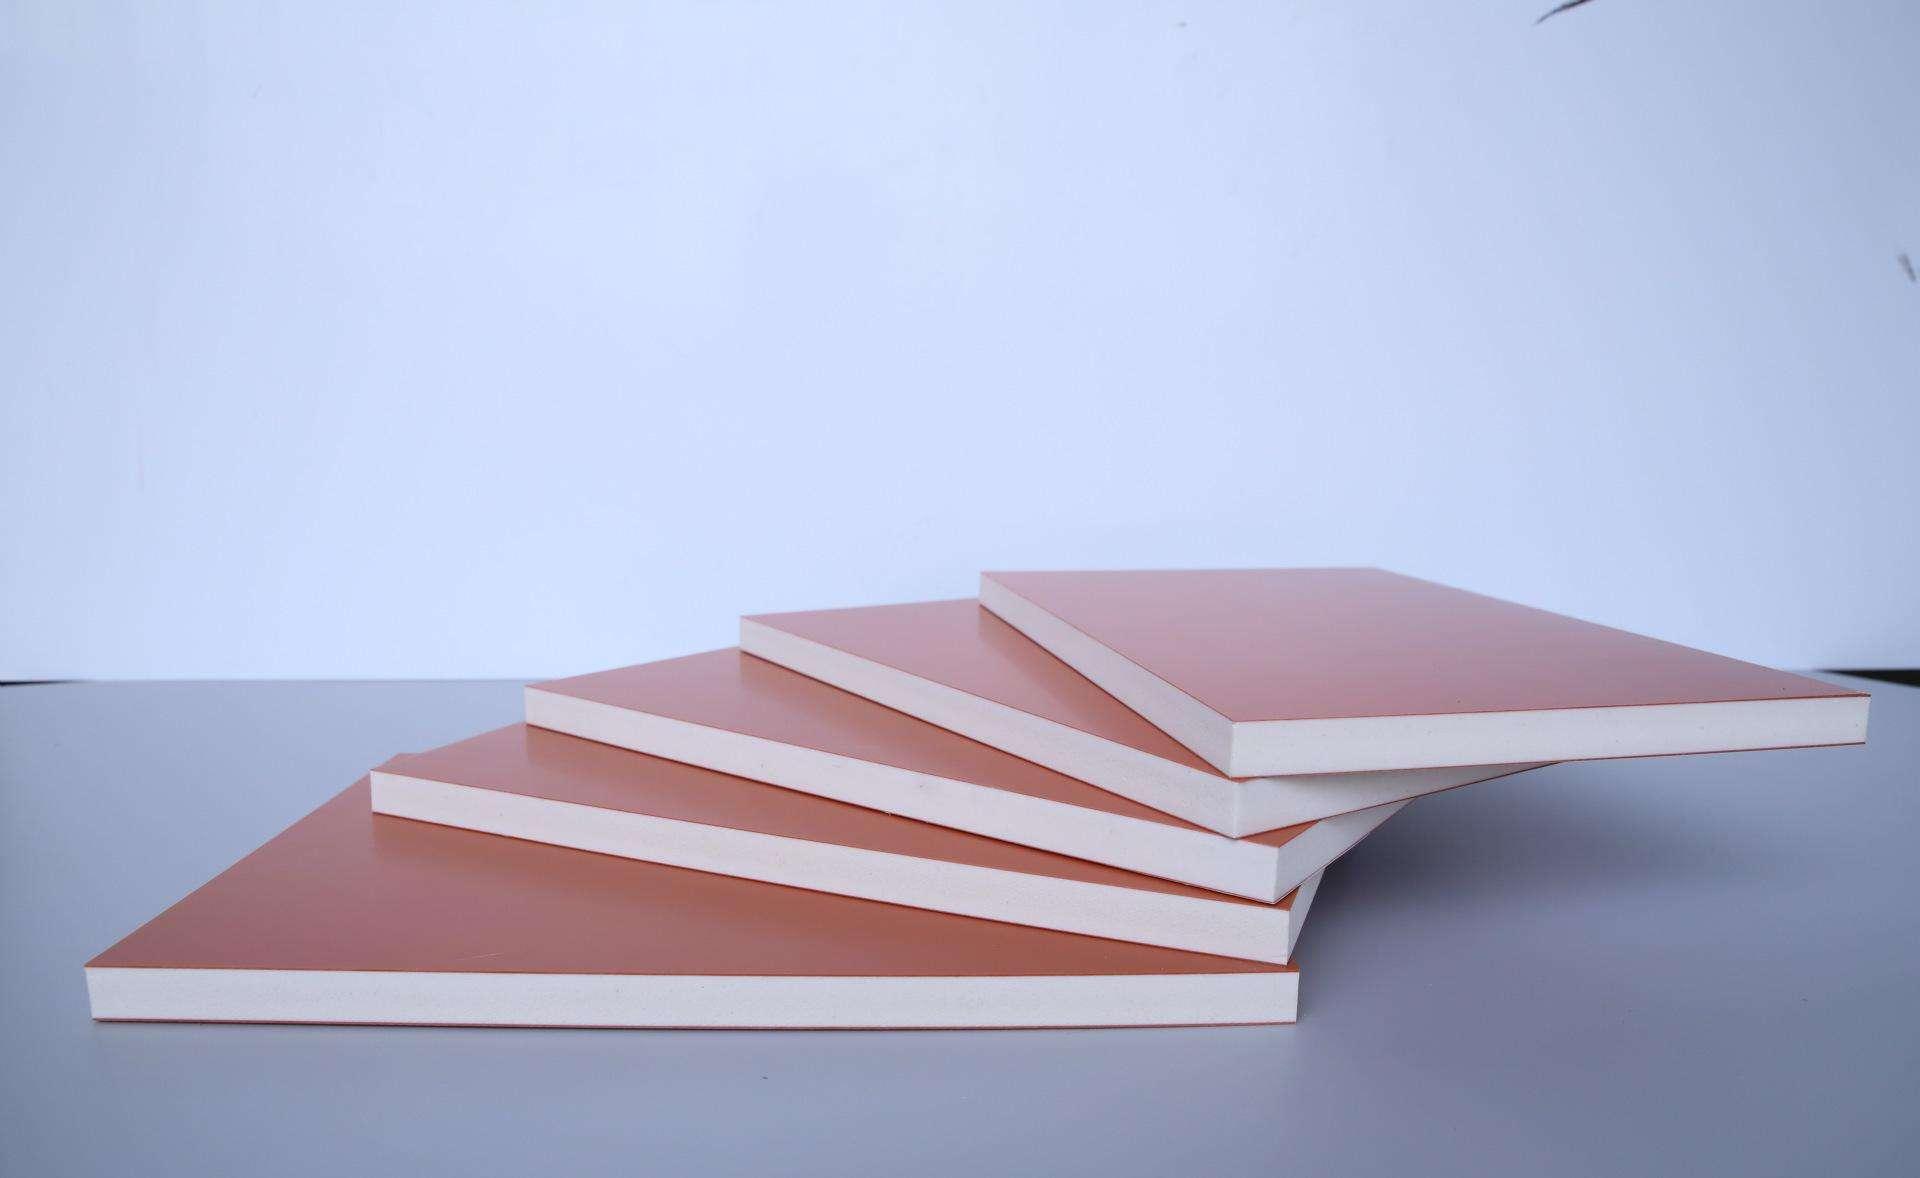 PVC广告板生产加工质量靠谱的原因是什么?